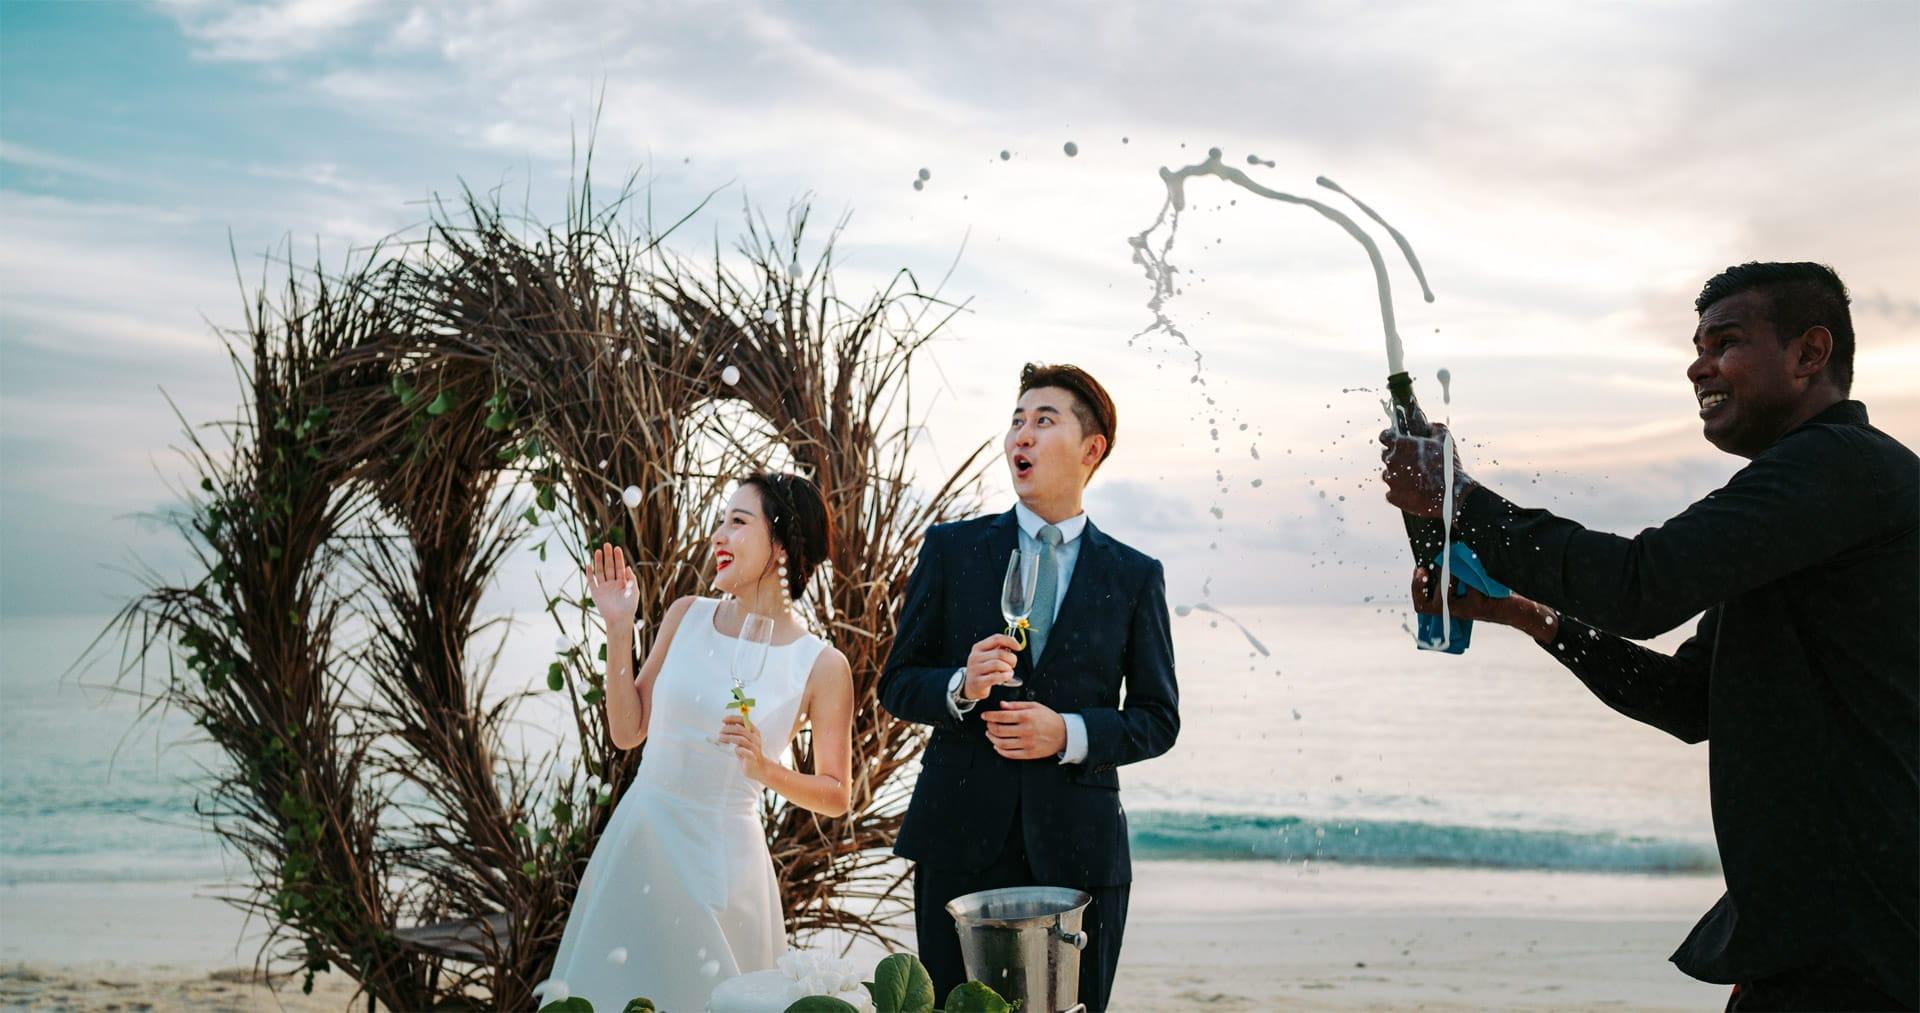 Celebratory champagne bottle opening in Wedding